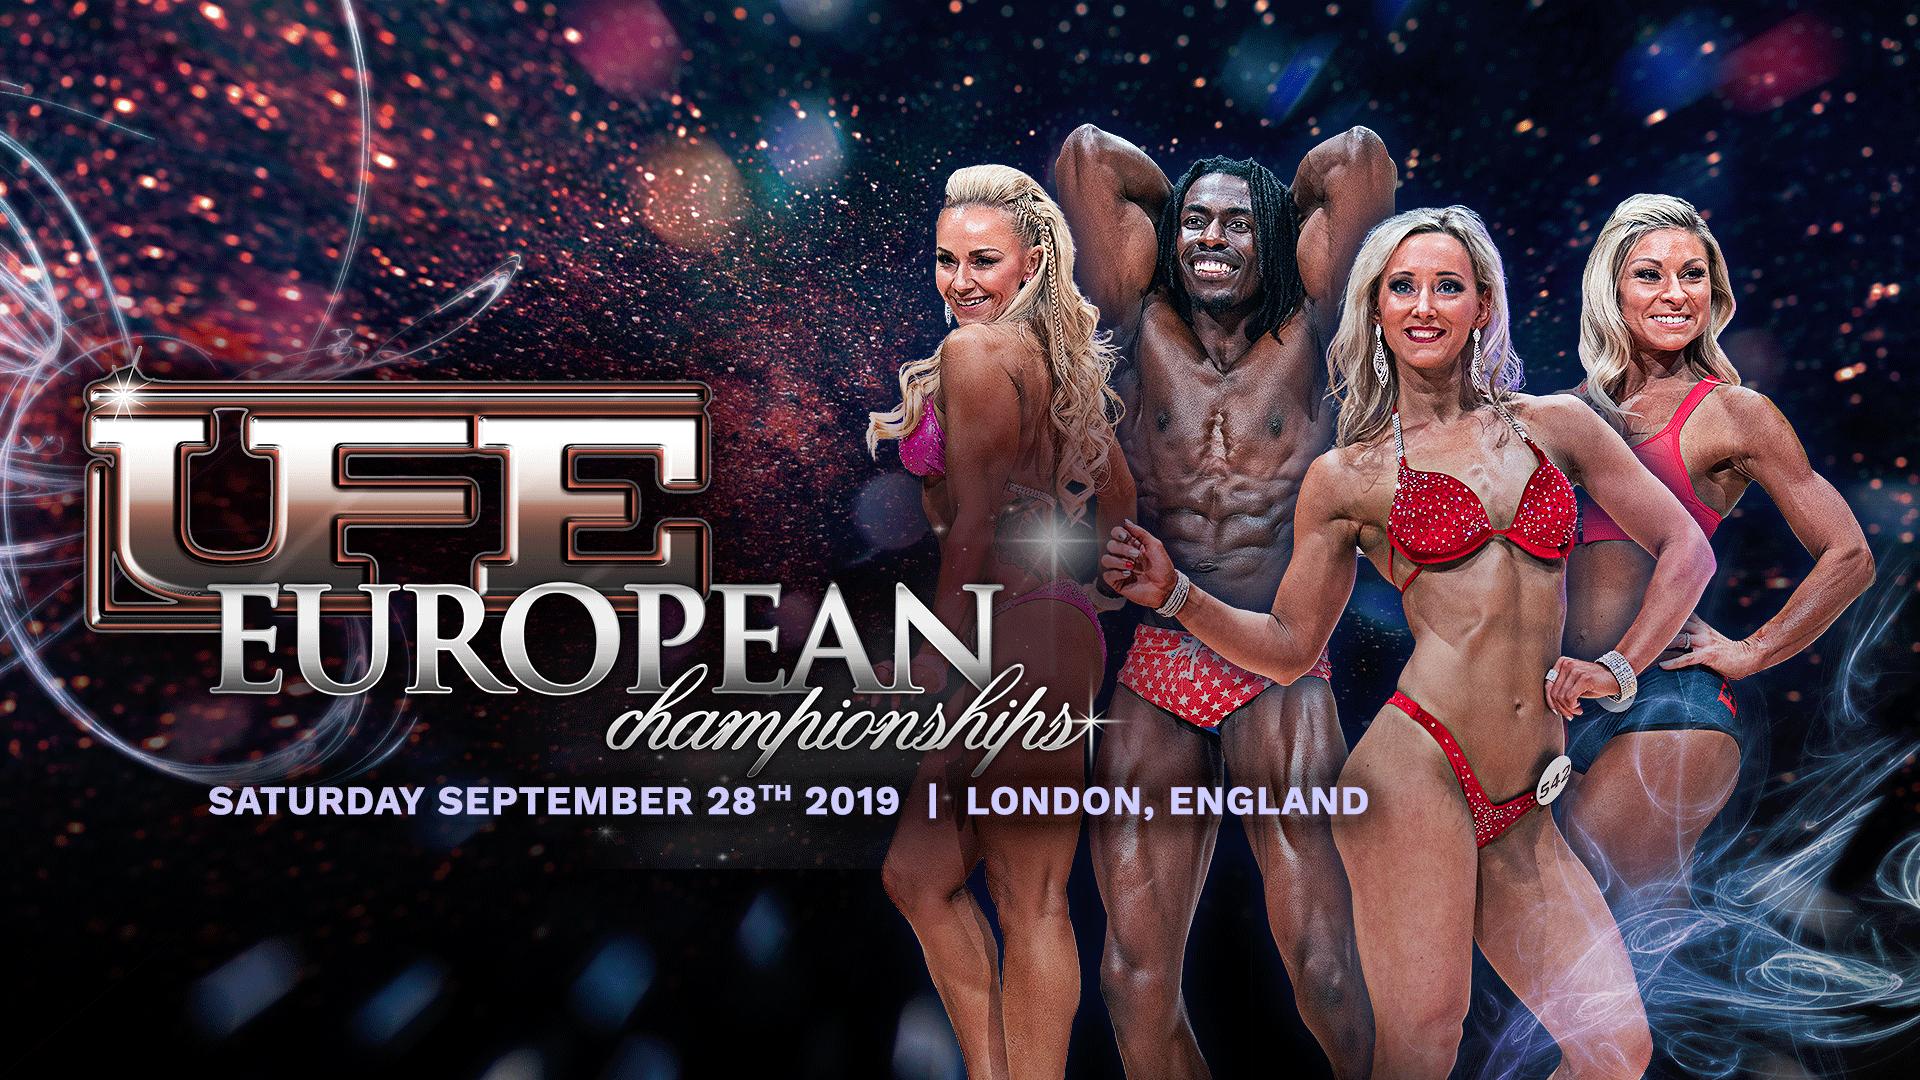 Ufe european championships banner 2019